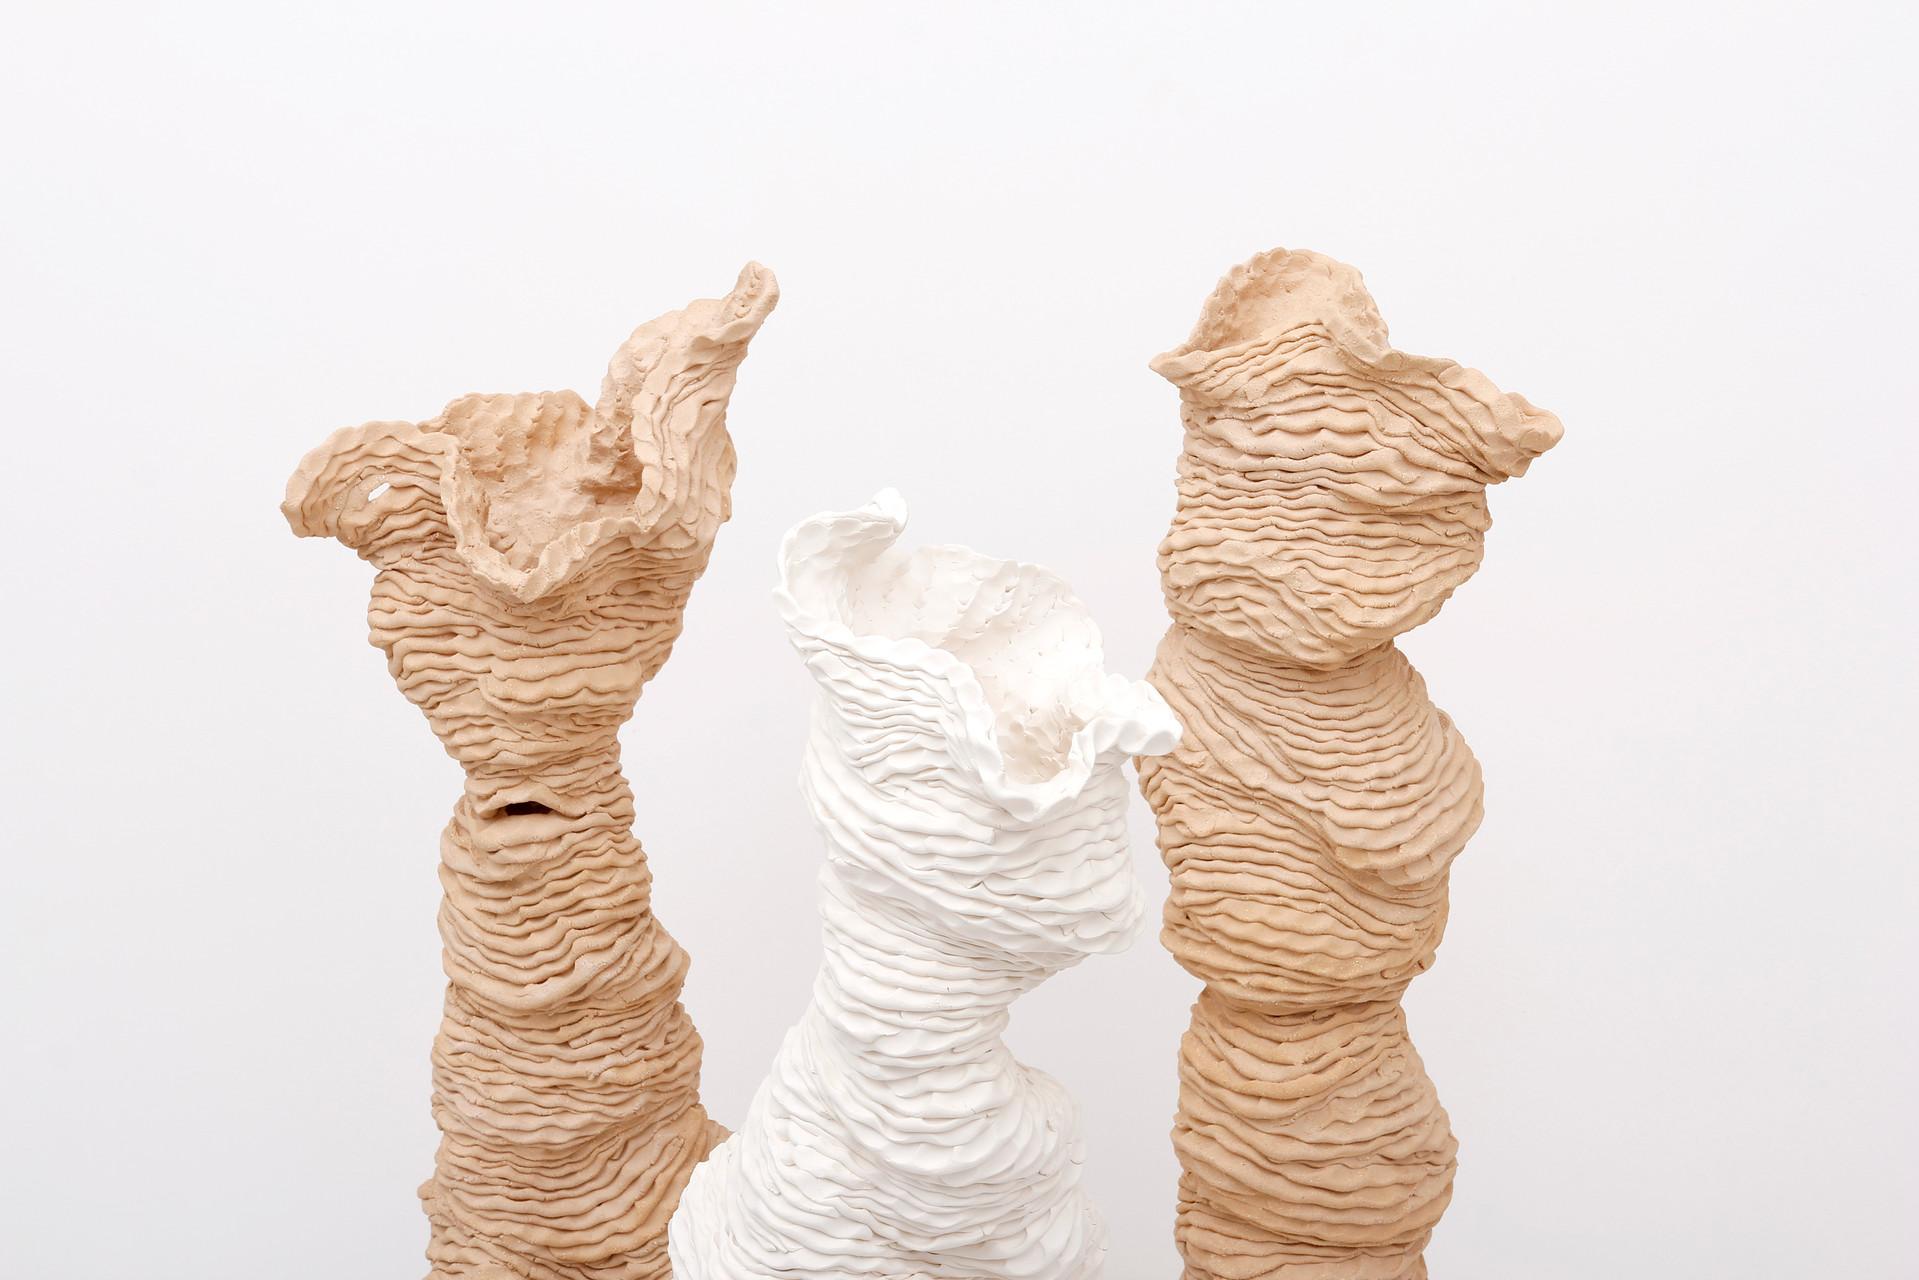 Sam Gold, Hive, 2020, porcelain and stoneware